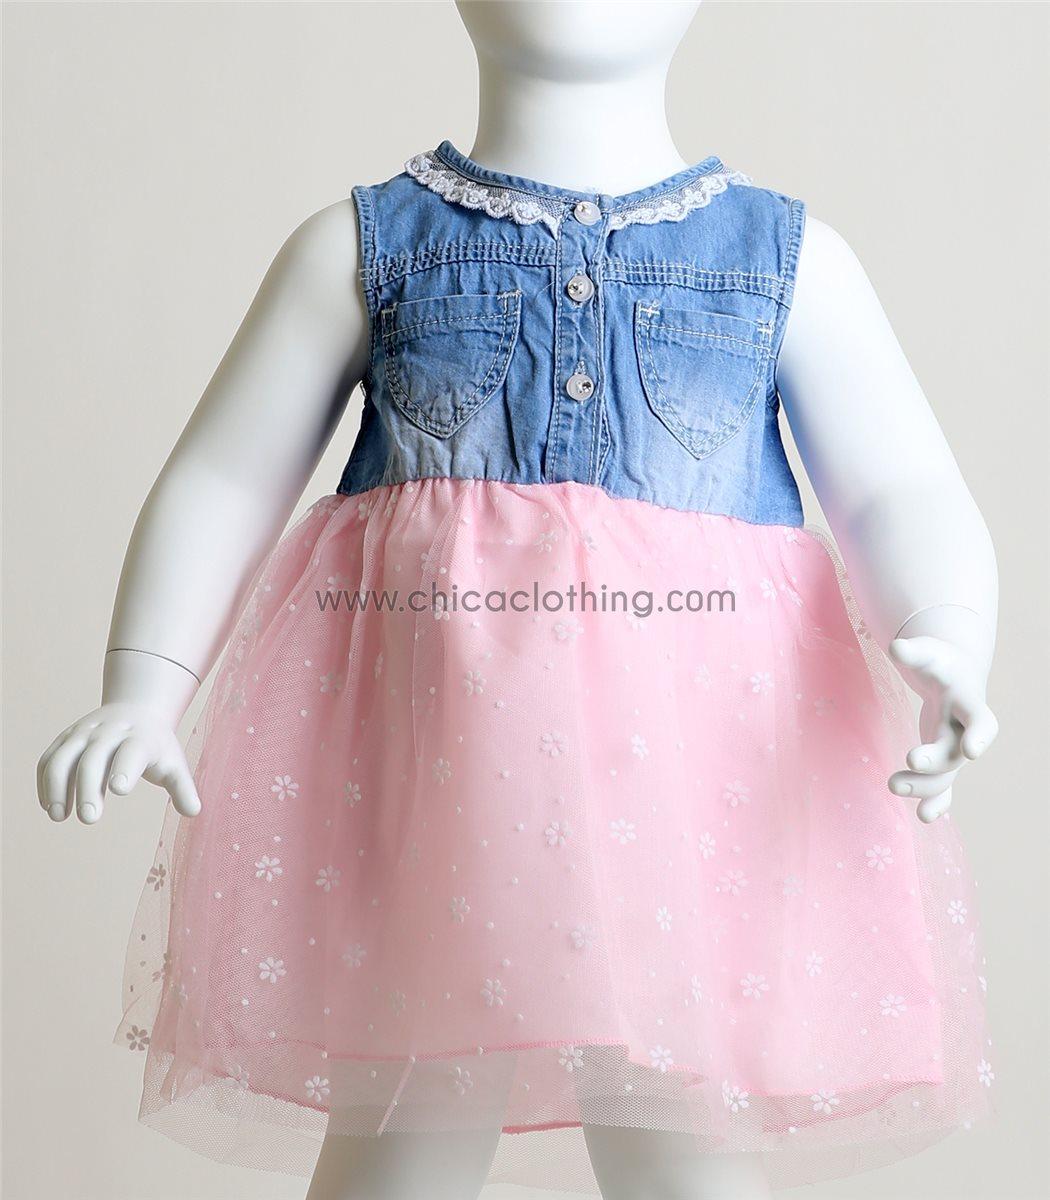 78263d1d6842 Βρεφικό φόρεμα με σχέδιο μαργαρίτες (Ροζ)